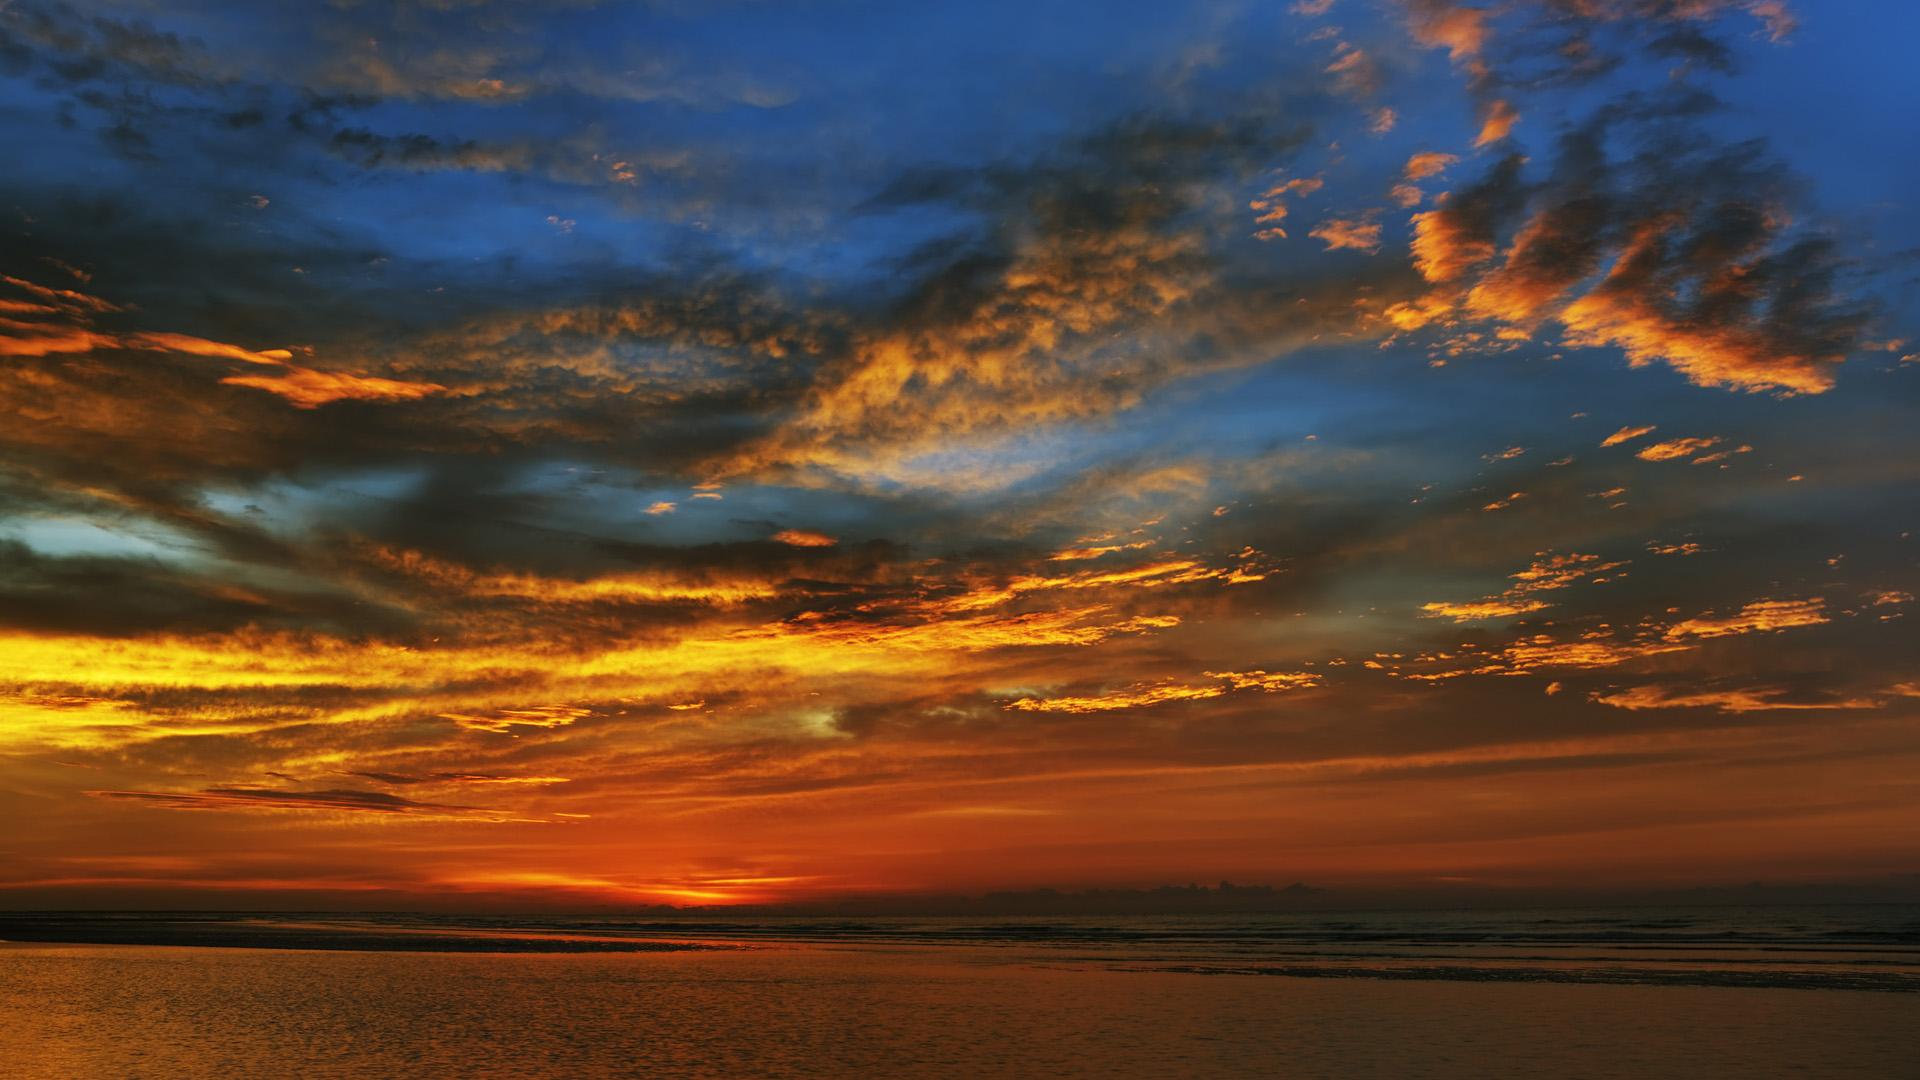 Sunset Hd Wallpaper Background Image 1920x1080 Id 292672